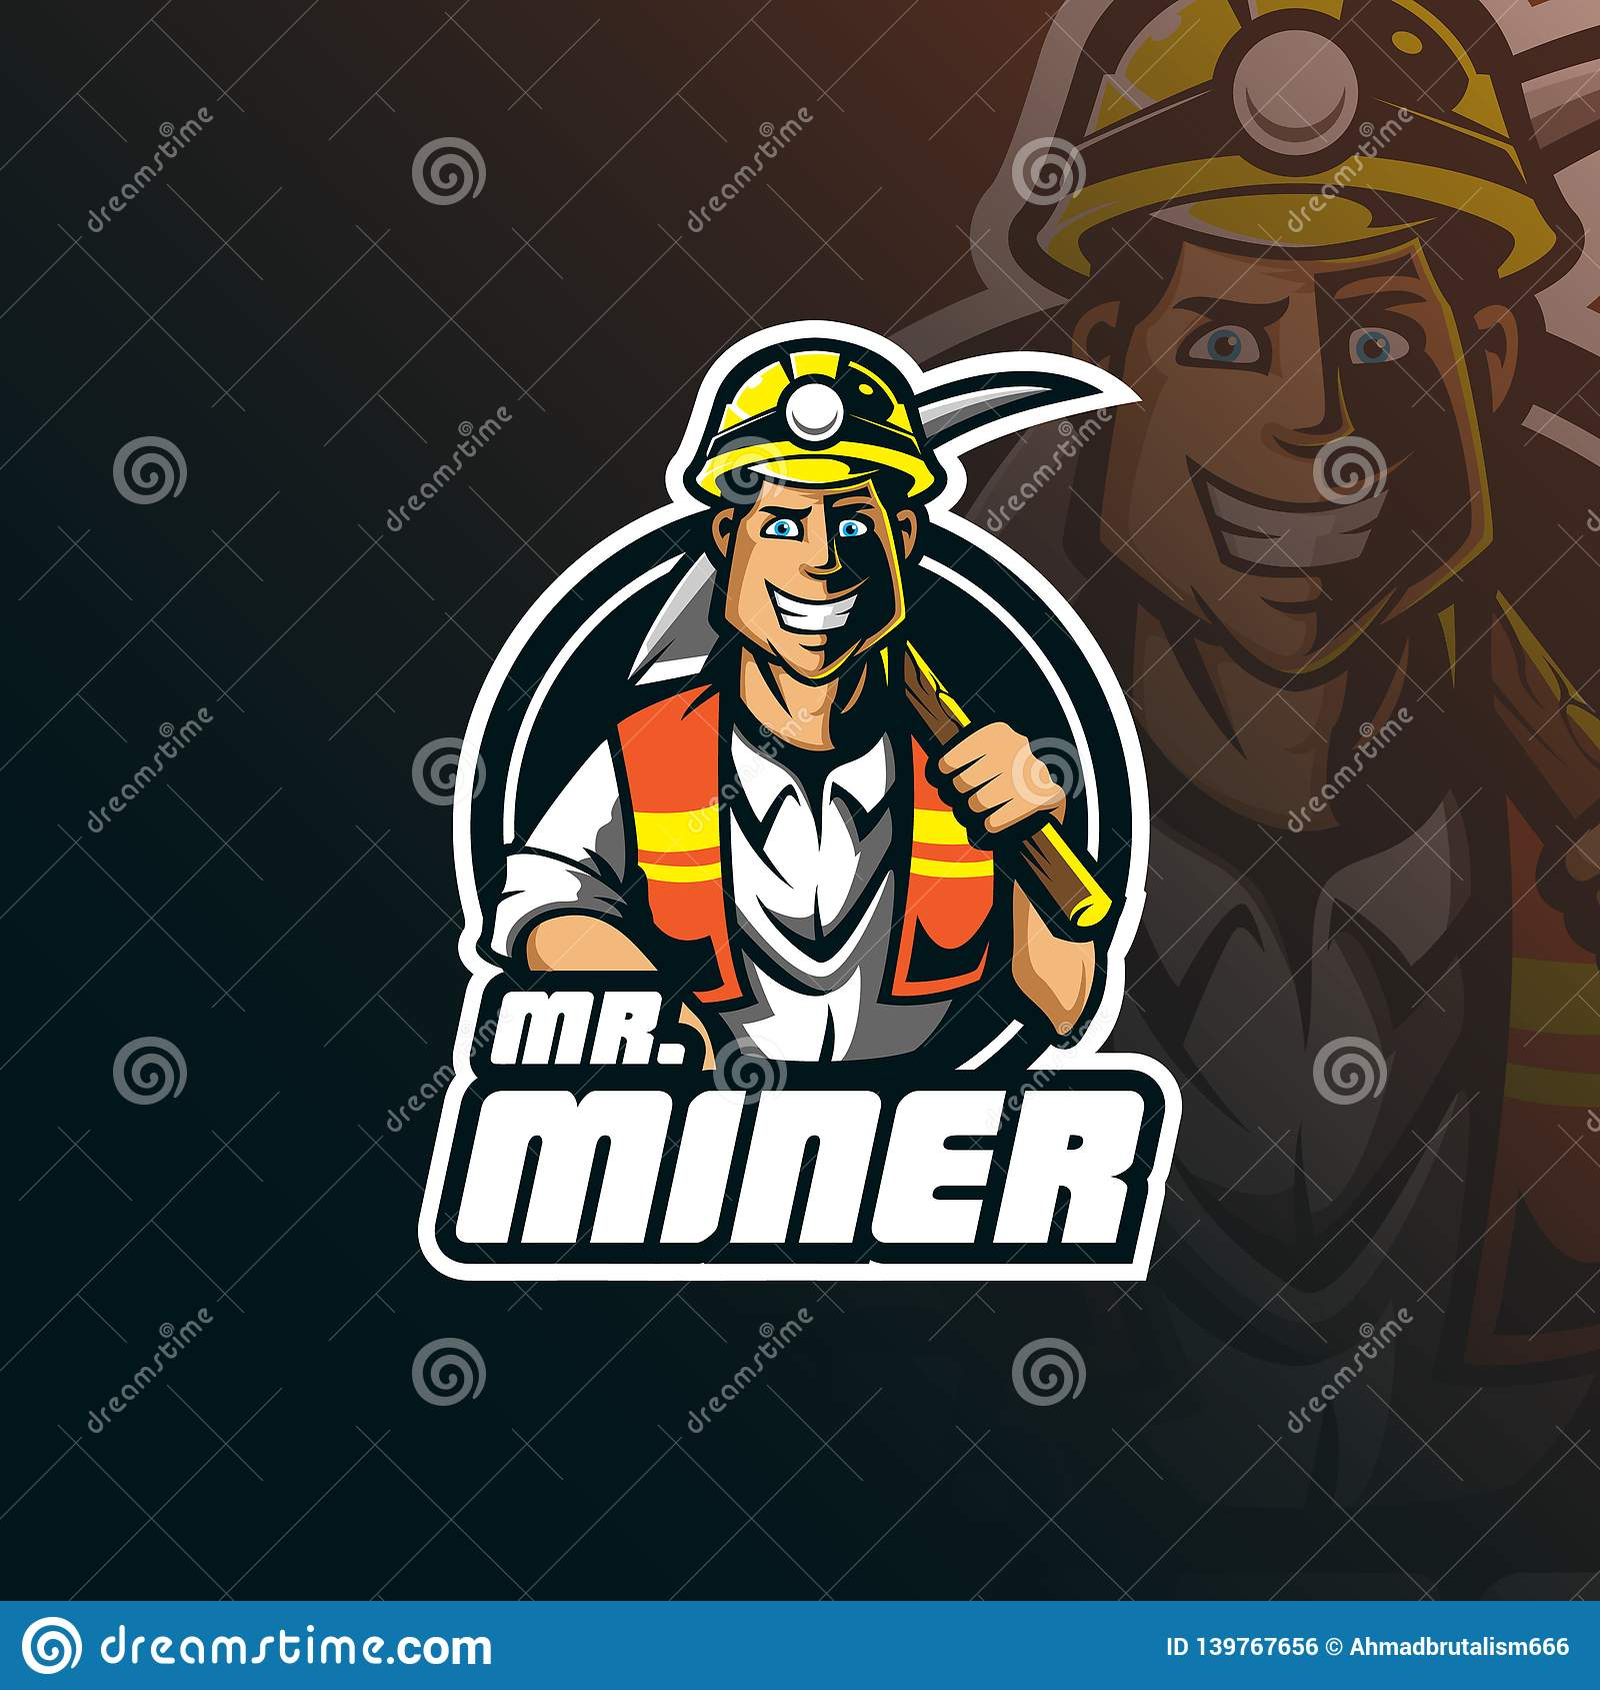 Miner vector mascot logo design with modern illustration concept style for badge, emblem and tshirt printing. smart miner